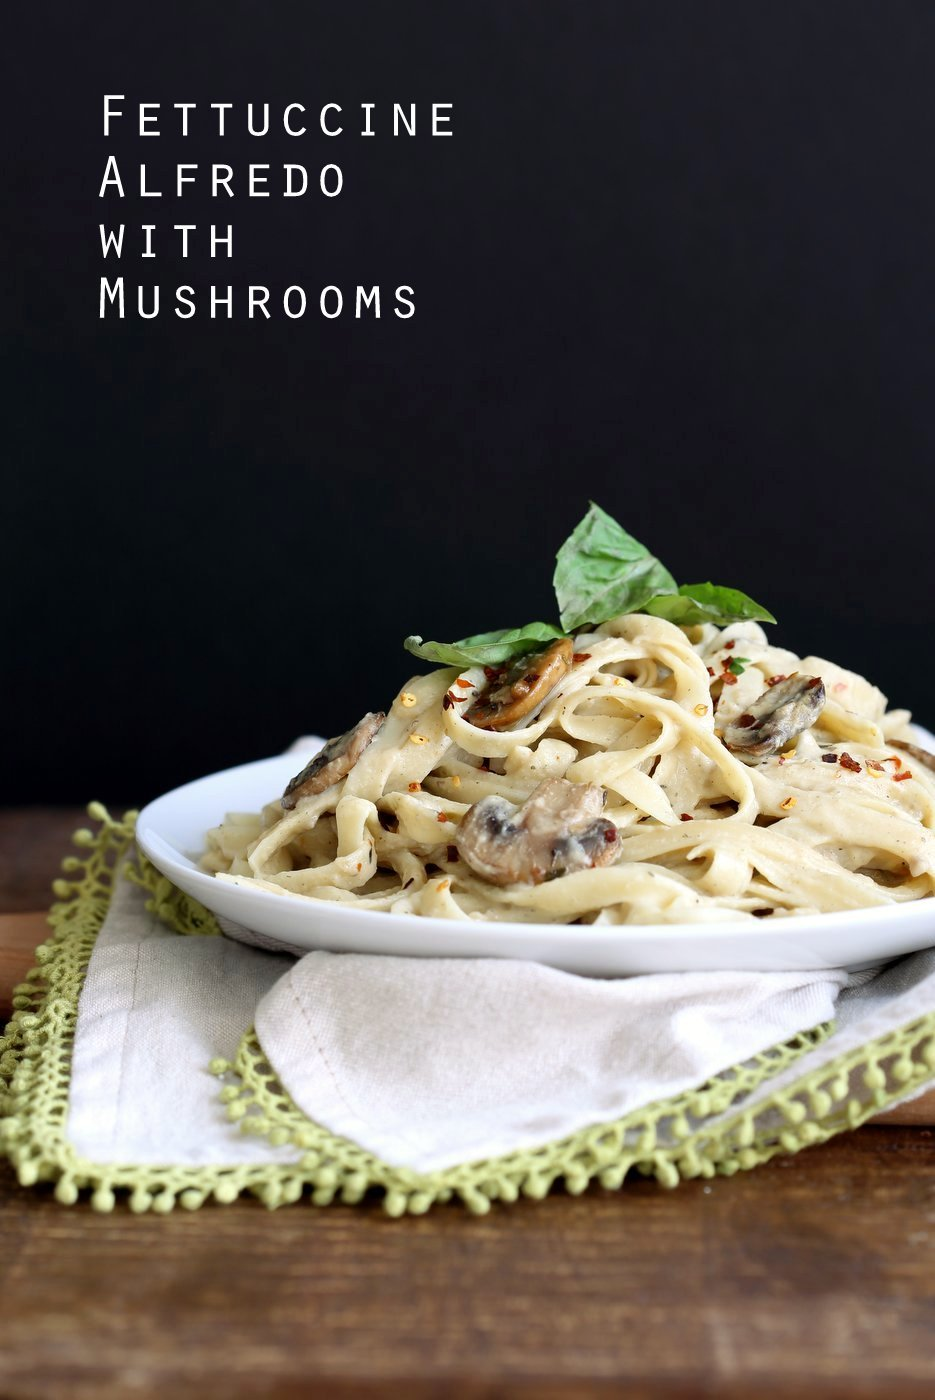 The Best Vegan Mushroom Garlic Alfredo with no nuts. Garlicky, Creamy, Amazing Vegan Fettuccine Alfredo. Nut-free, Easily Gluten-free, soy-free. 21 gm of protein per serving! | VeganRicha.com